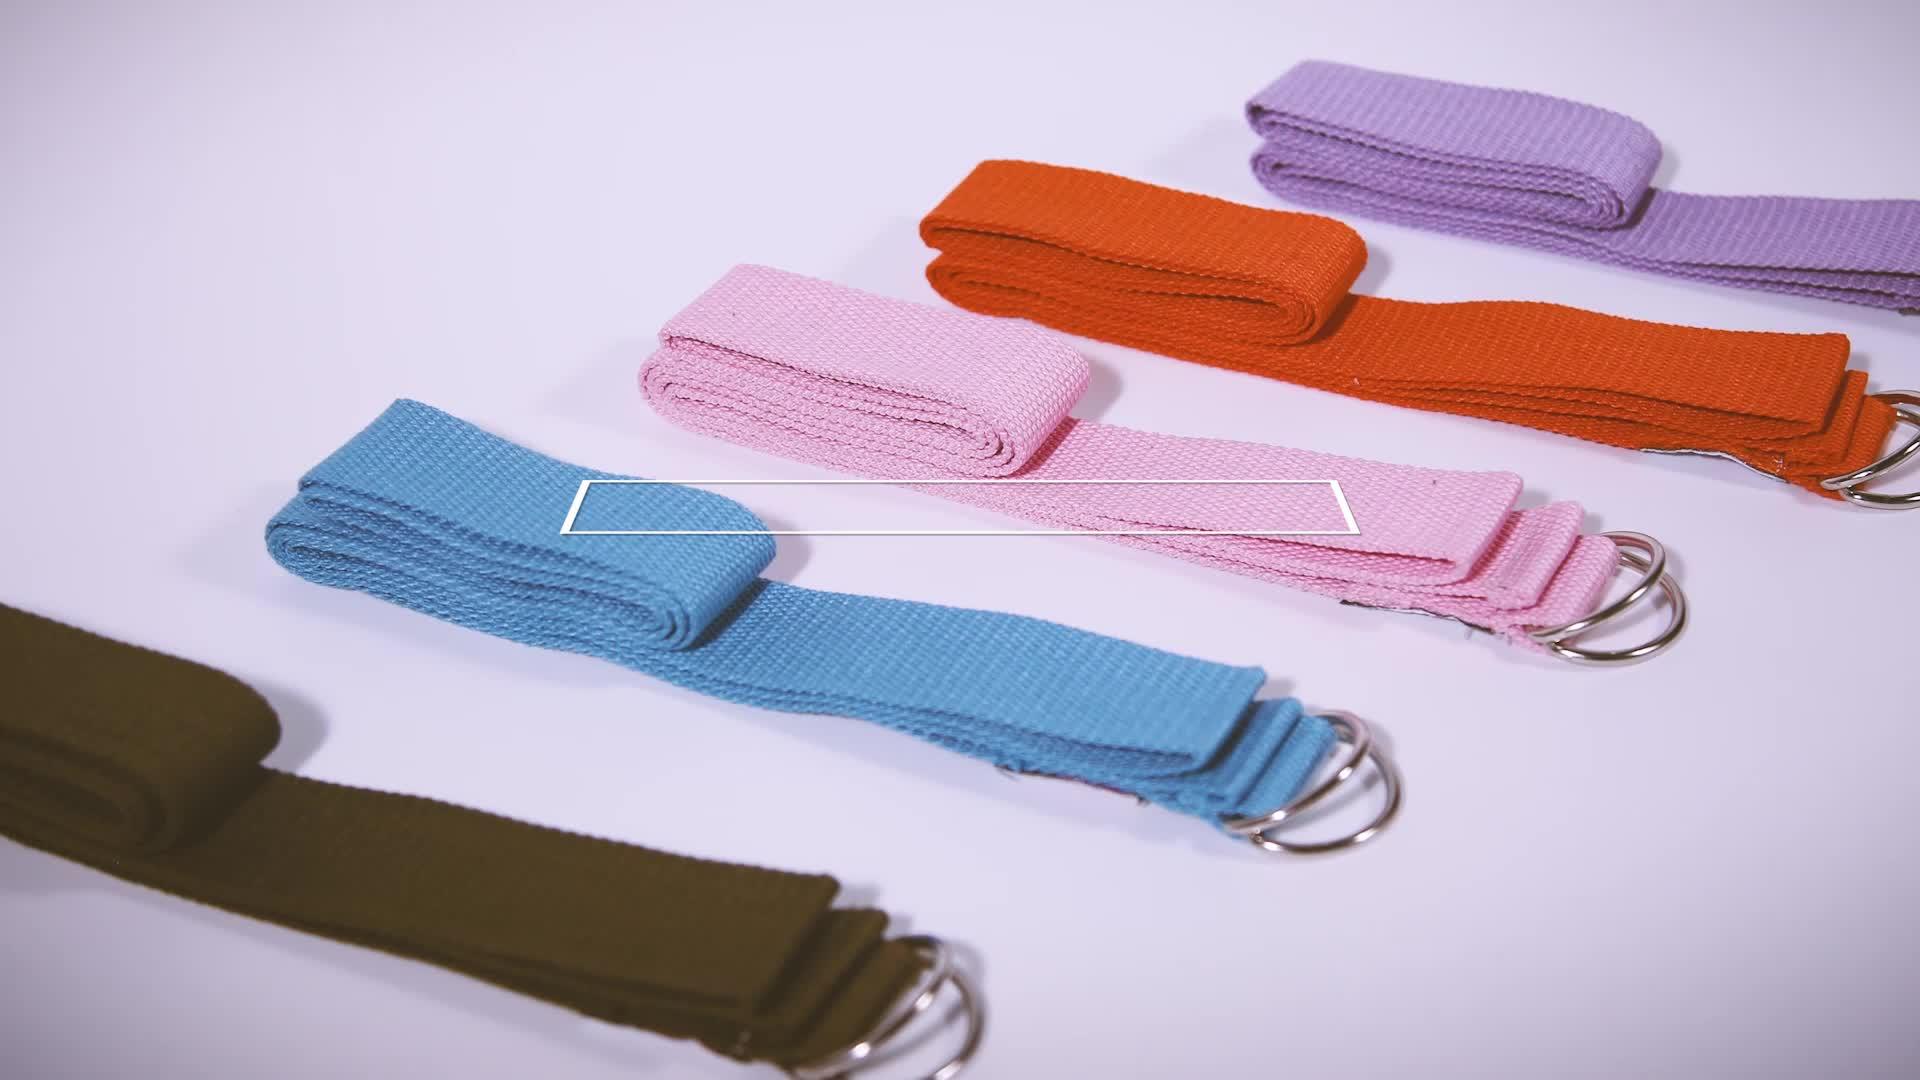 Hoge kwaliteit kleurrijke katoen stretching yoga band met private label